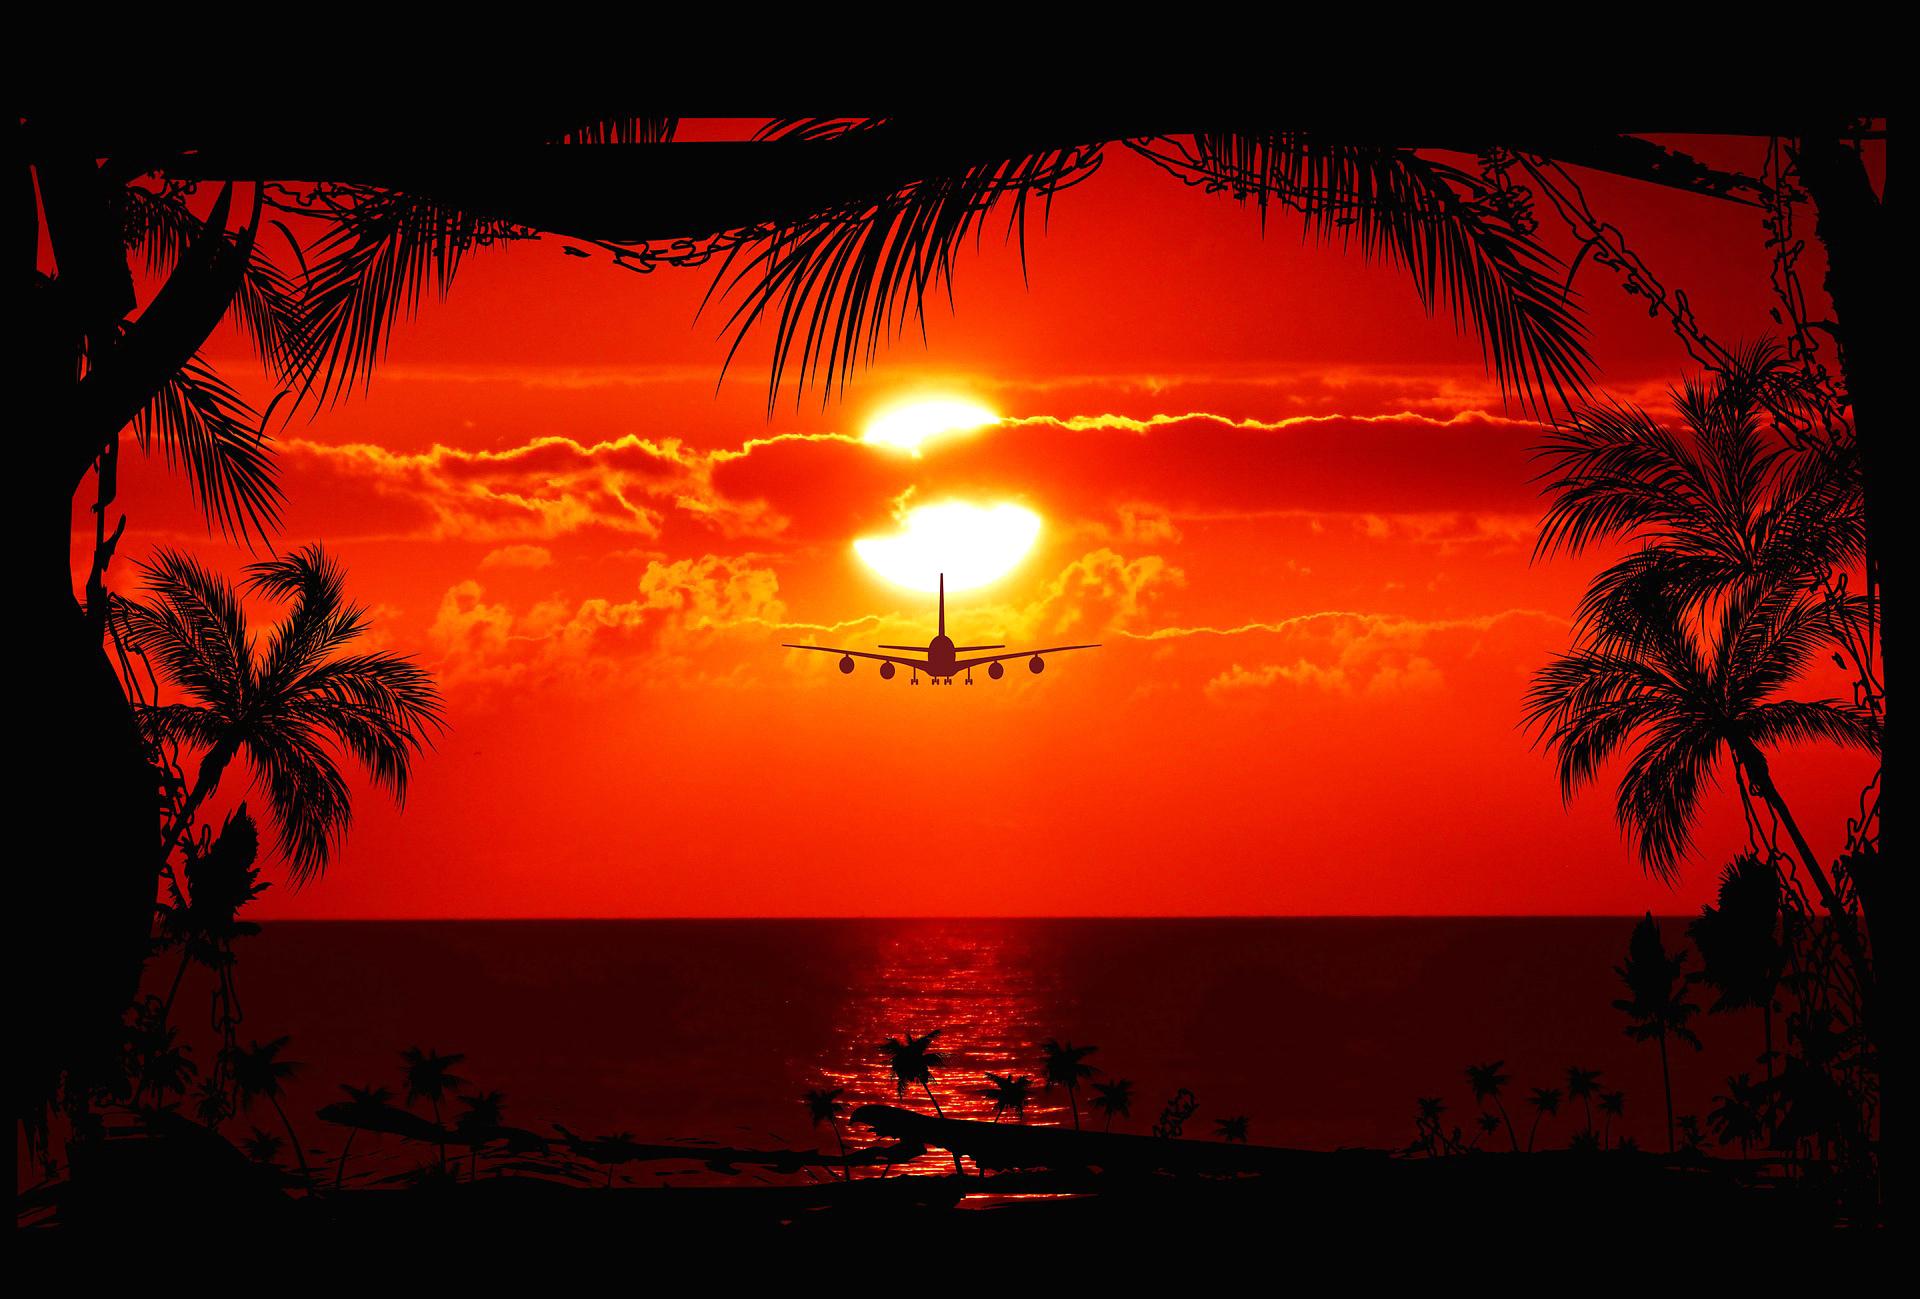 Avion Coucher De Soleil 10 000 Fonds D Ecran Hd Gratuits